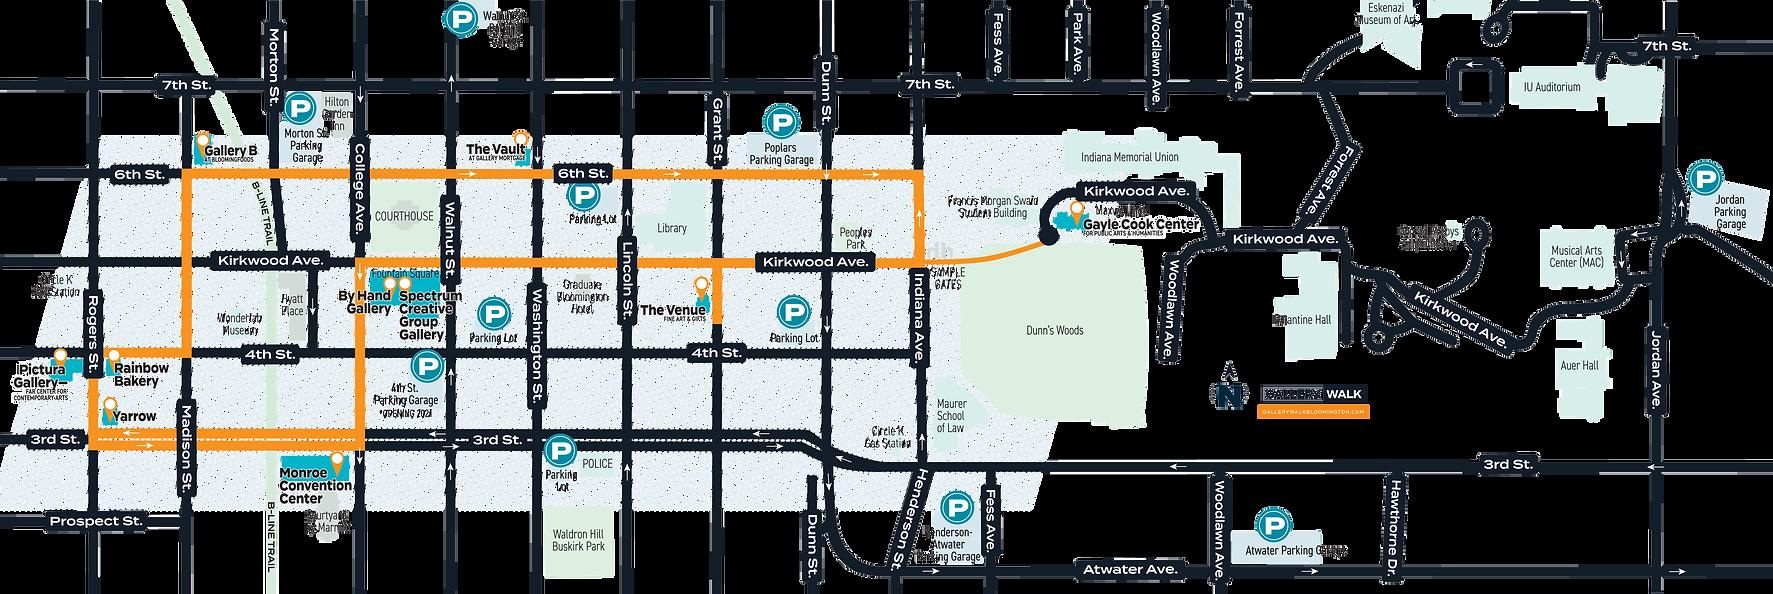 Gallery Walk Bloomington map